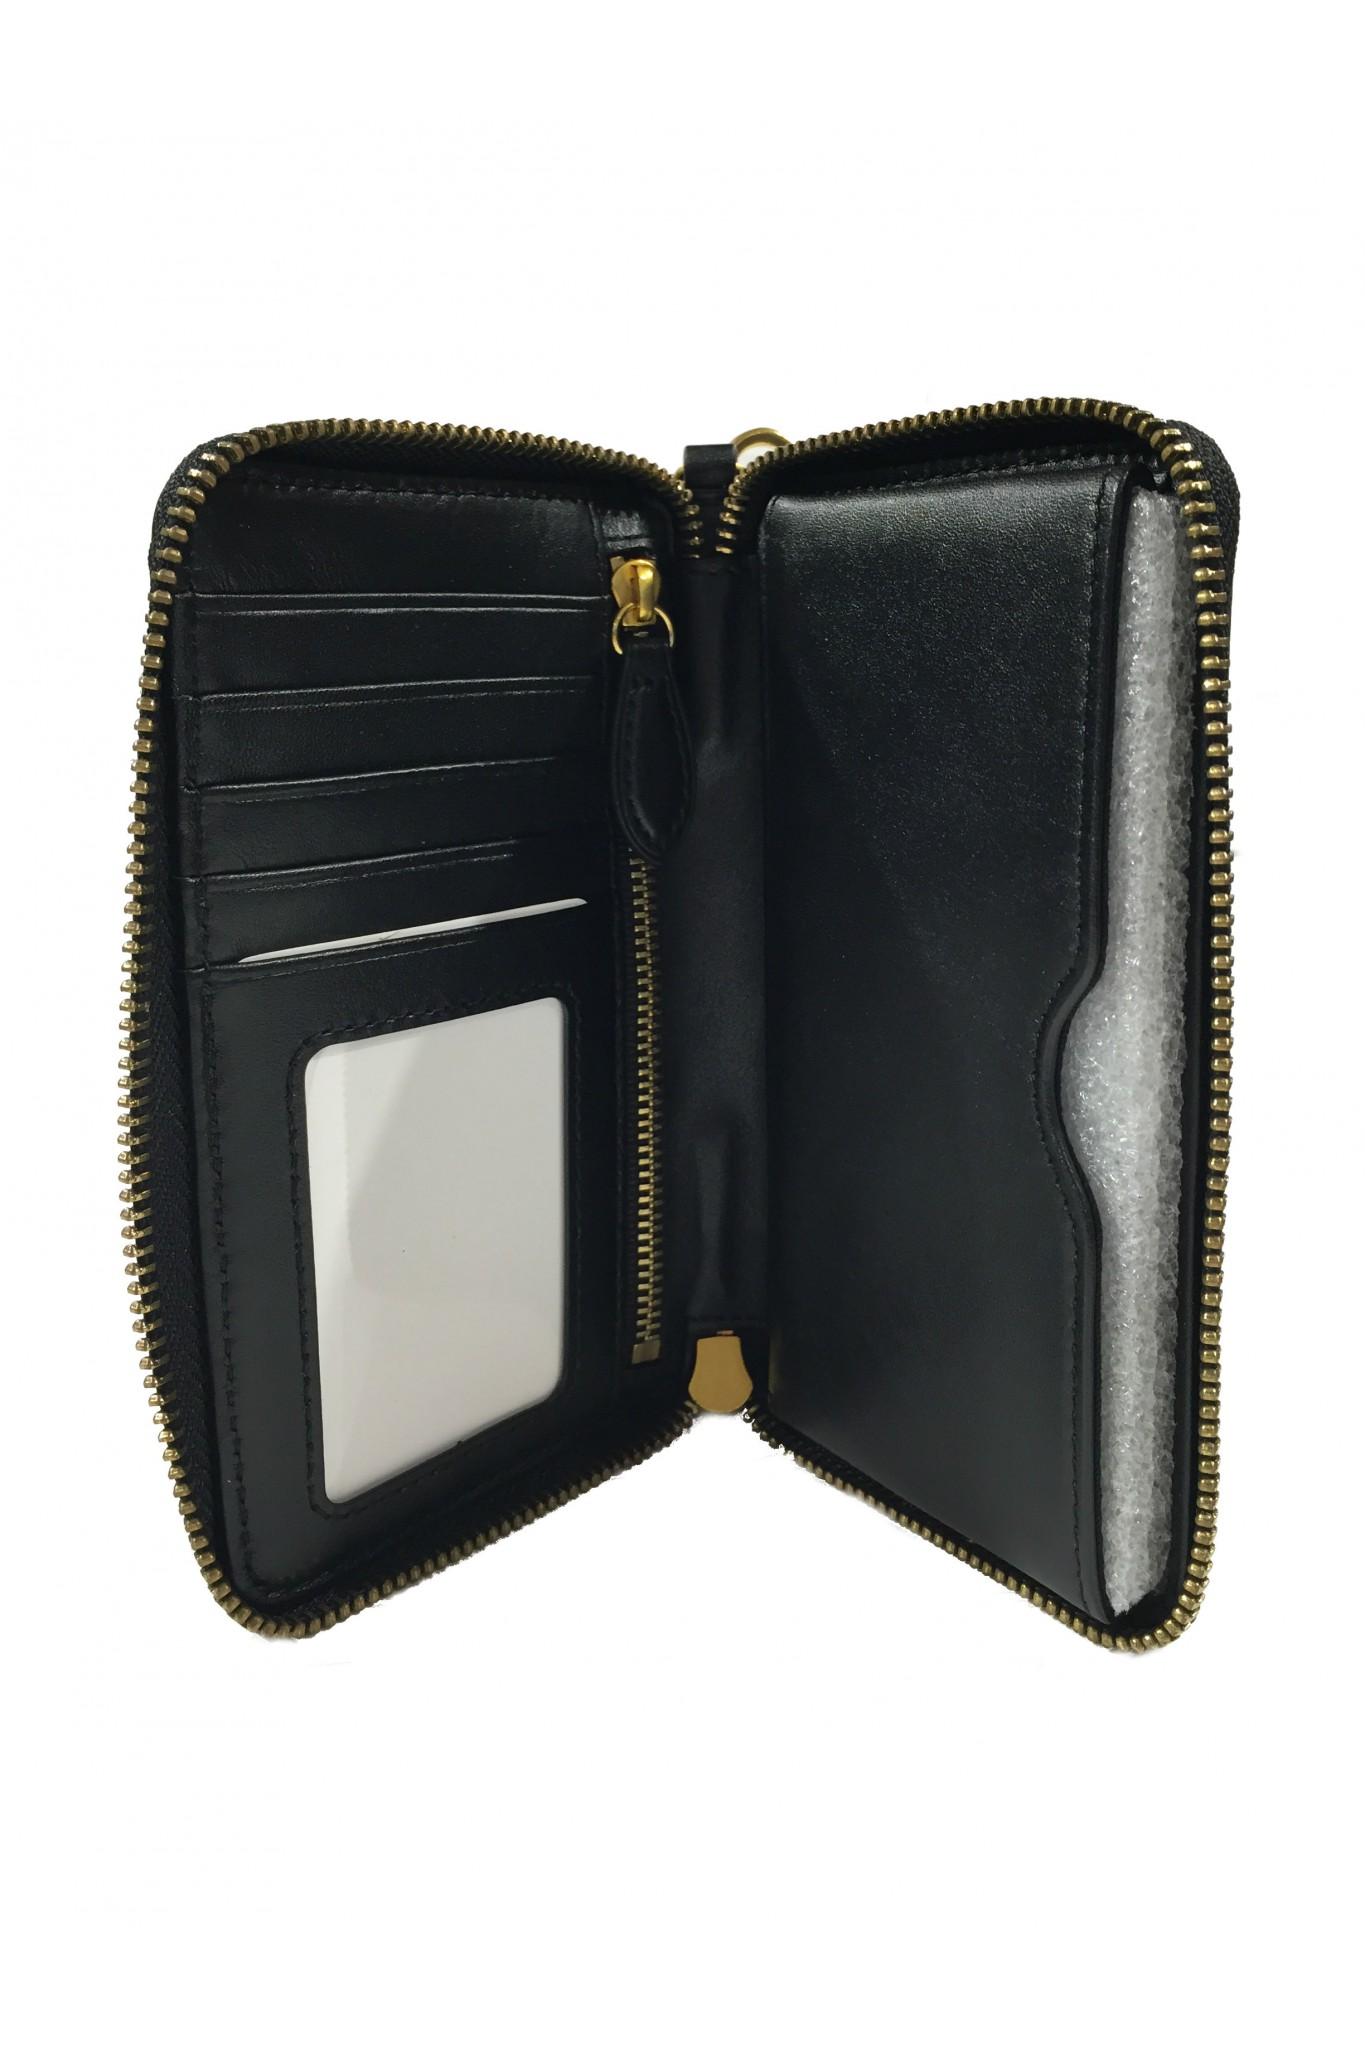 save off 97cfe 5ca15 Vendita online portafogli da donna Ralph Lauren media grandezza